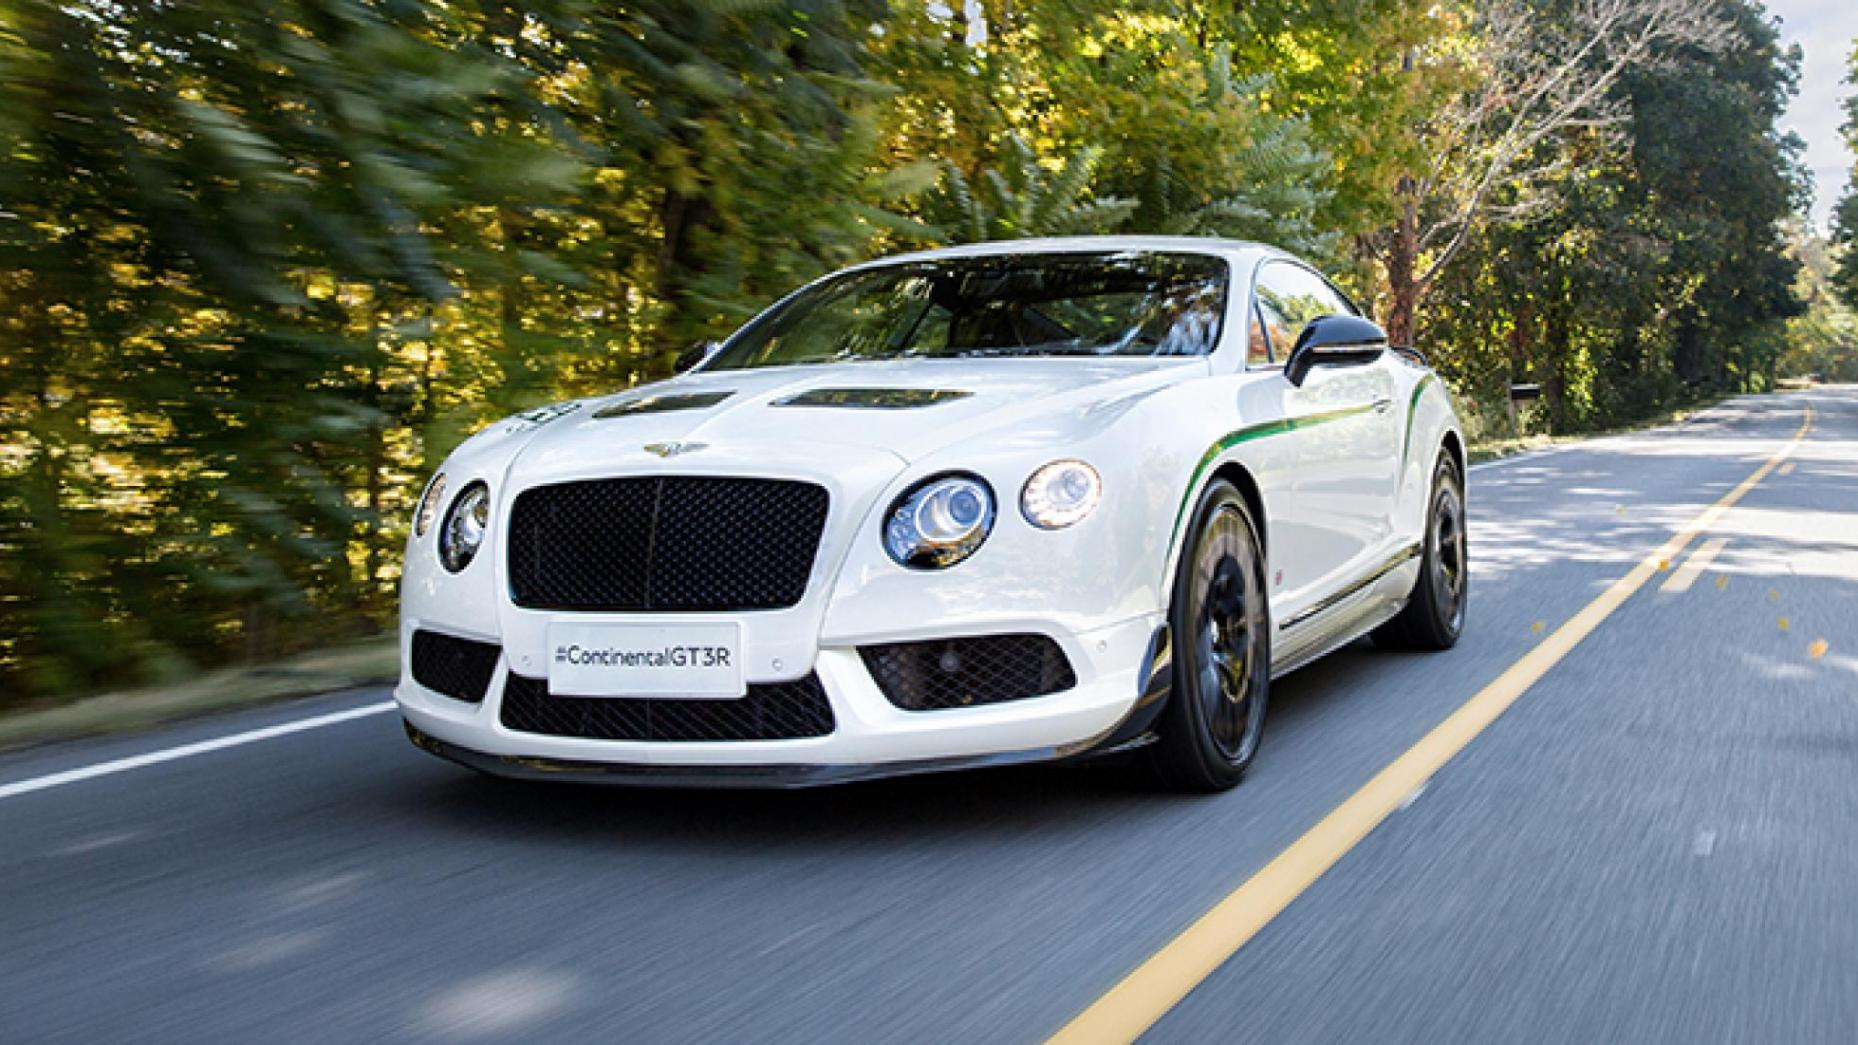 3-Bentley Continental GT3-R 572bhp, 170mph